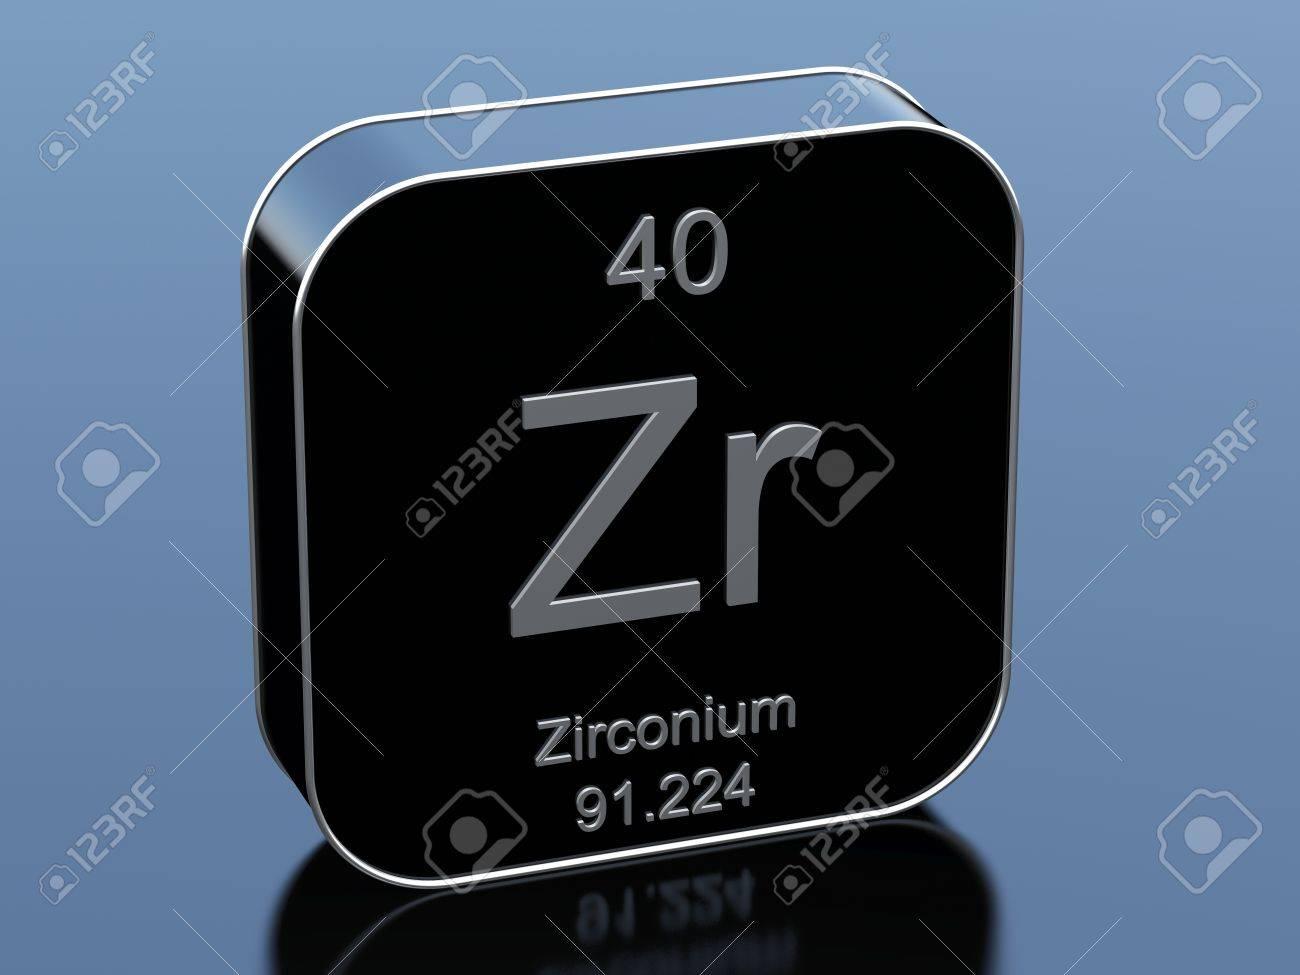 Zirconium from periodic table stock photo picture and royalty zirconium from periodic table stock photo 71643818 gamestrikefo Images